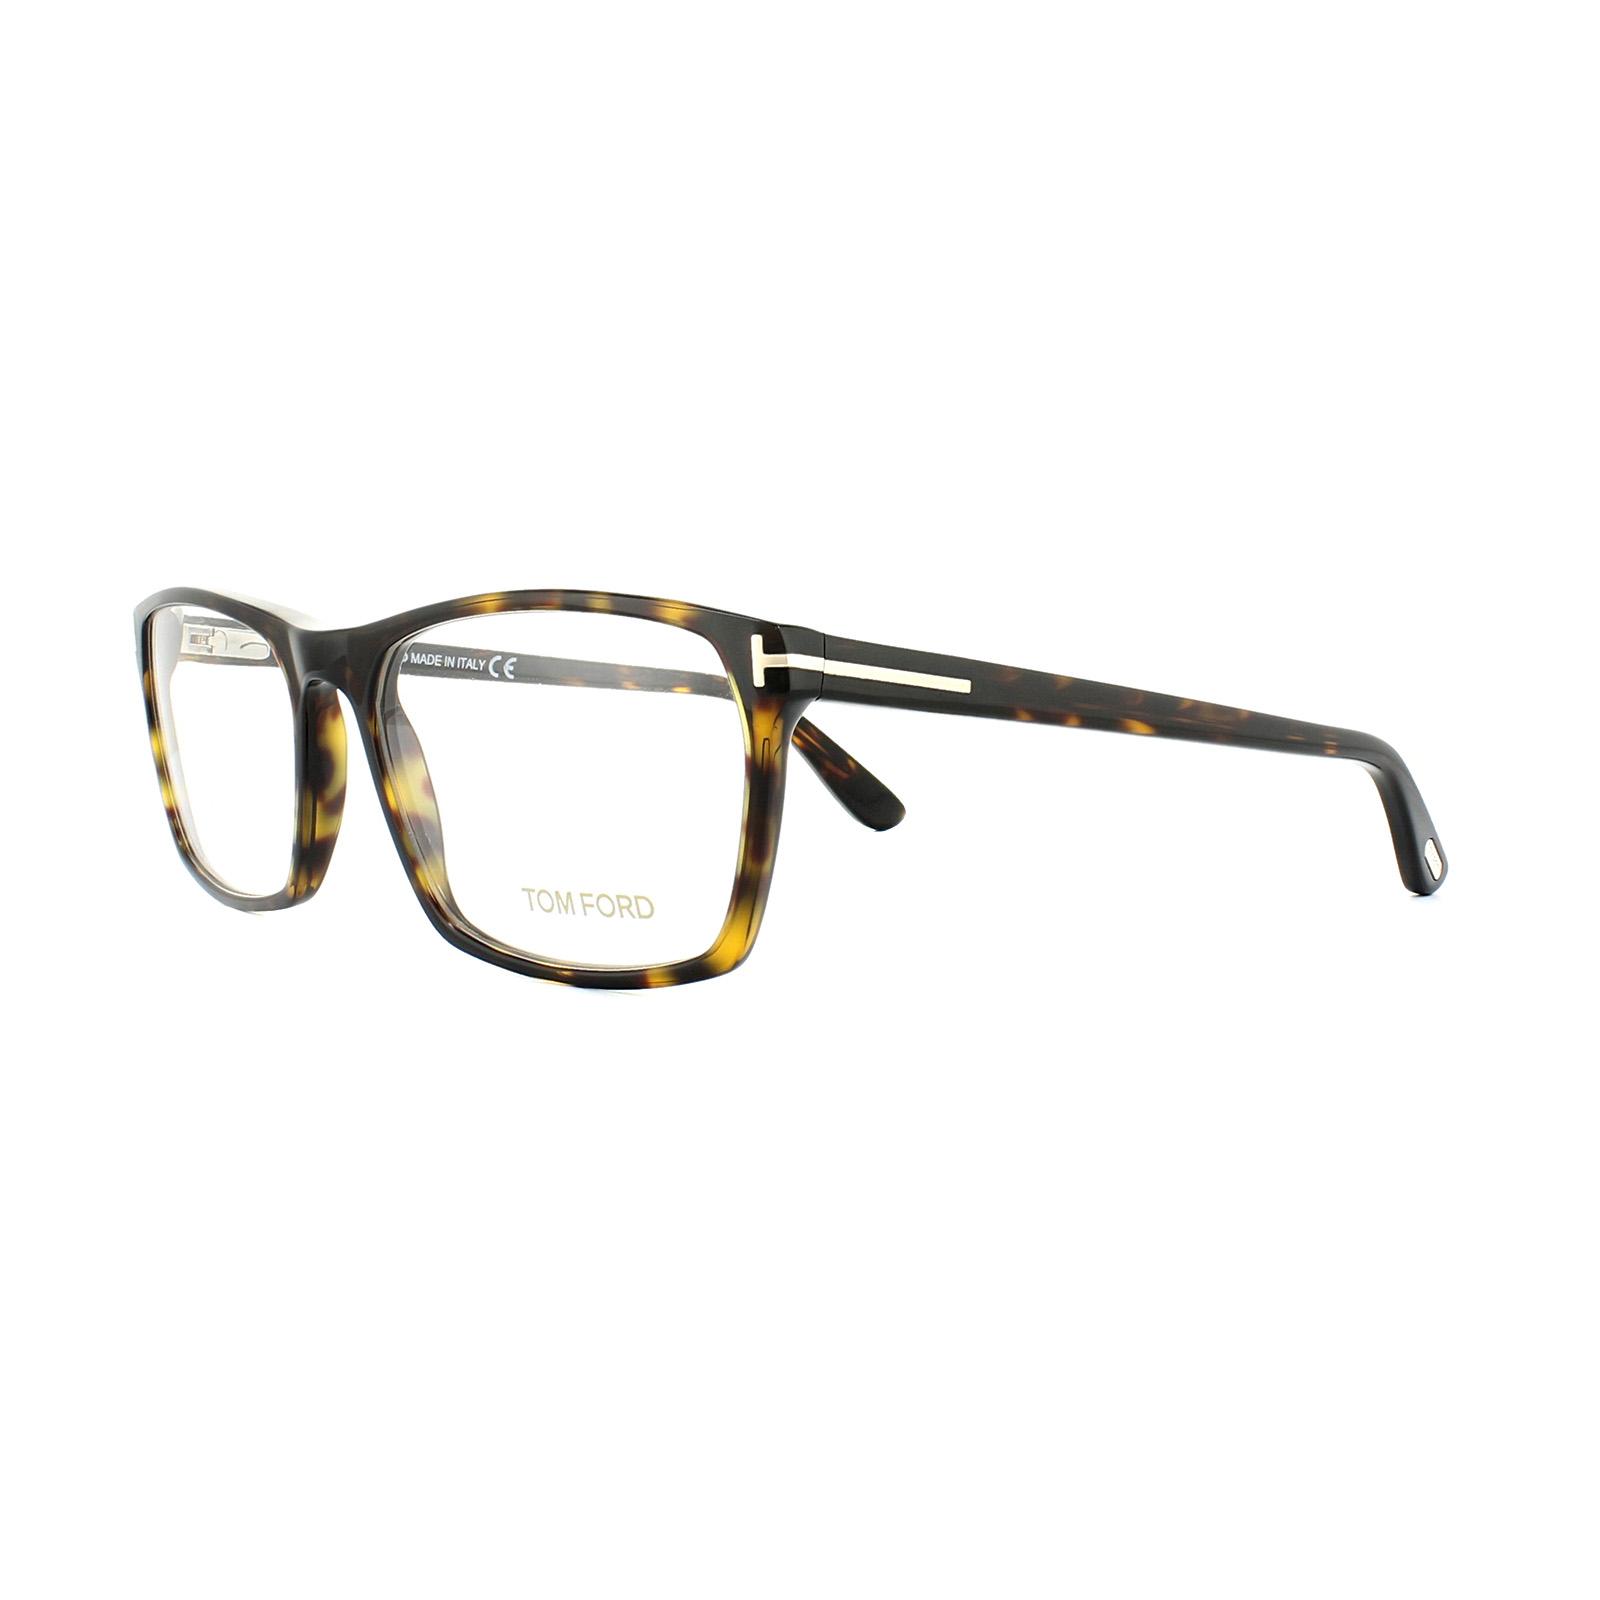 24e6a3a04192f Cheap Tom Ford FT5295 Glasses Frames - Discounted Sunglasses